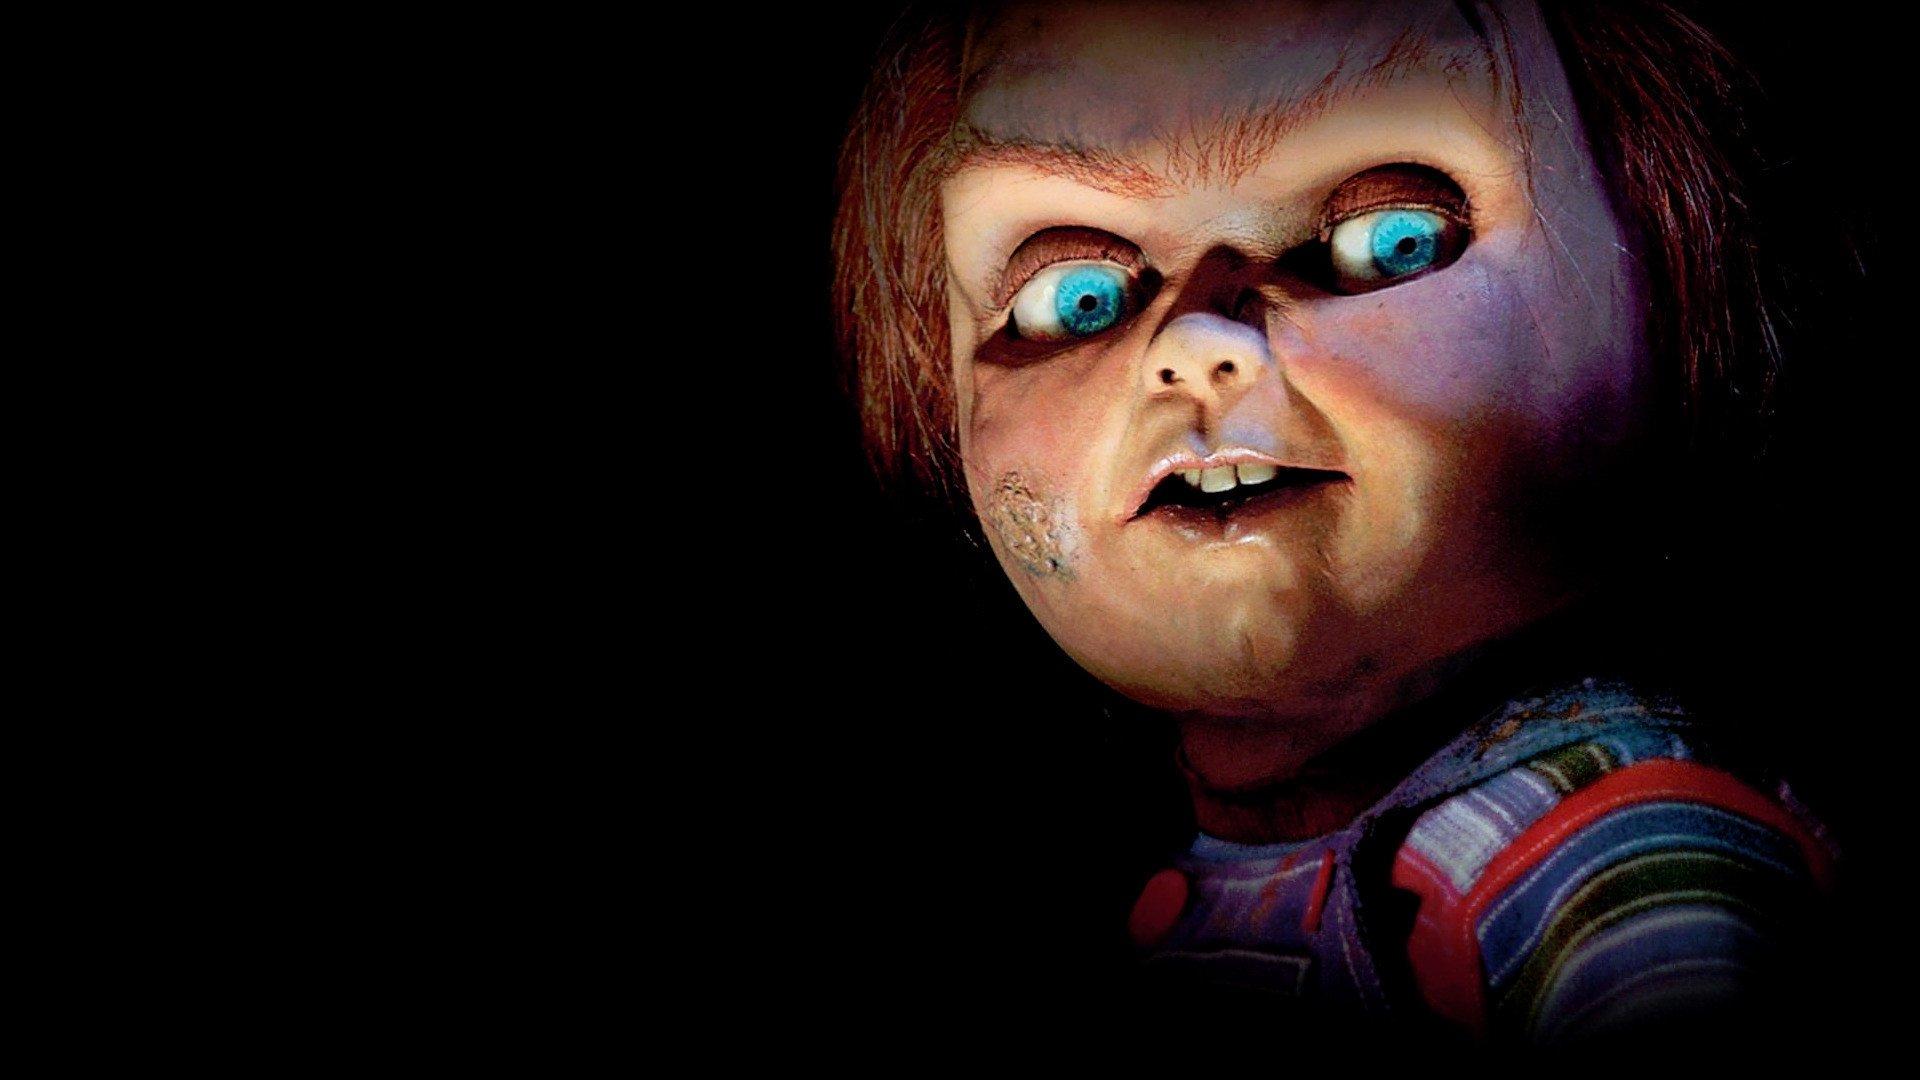 CHILDS PLAY chucky dark horror creepy